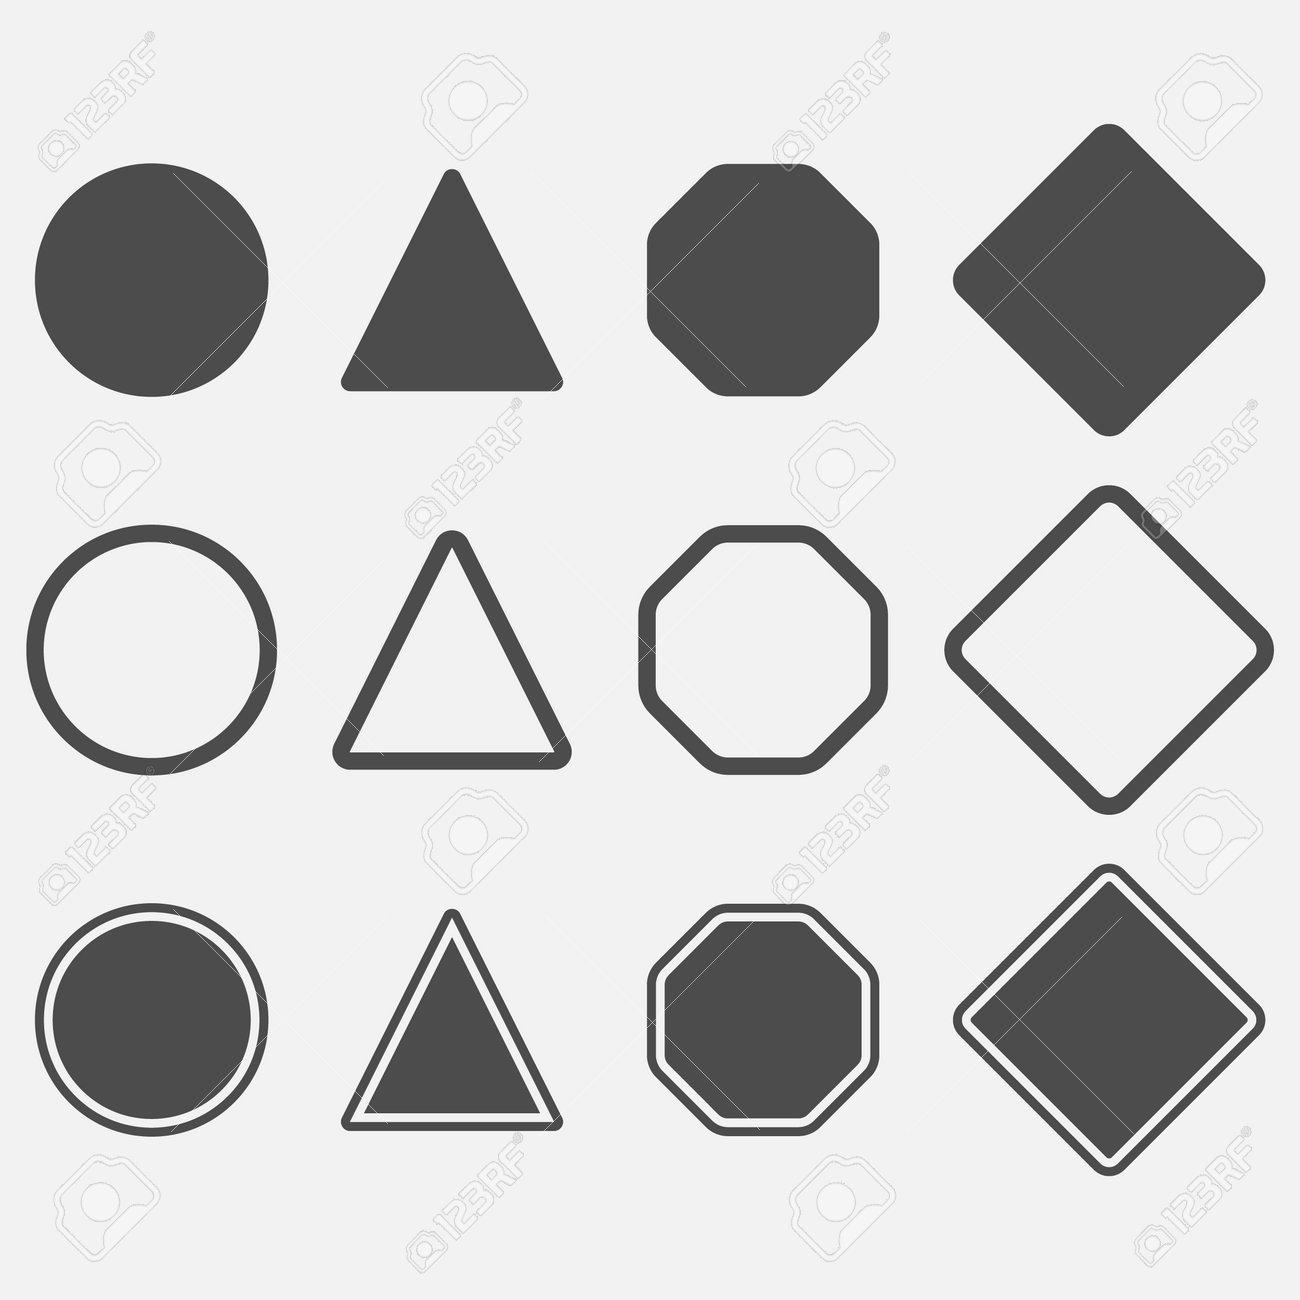 Blank danger simple icon set. Vector illustration. Eps 10. - 166654002